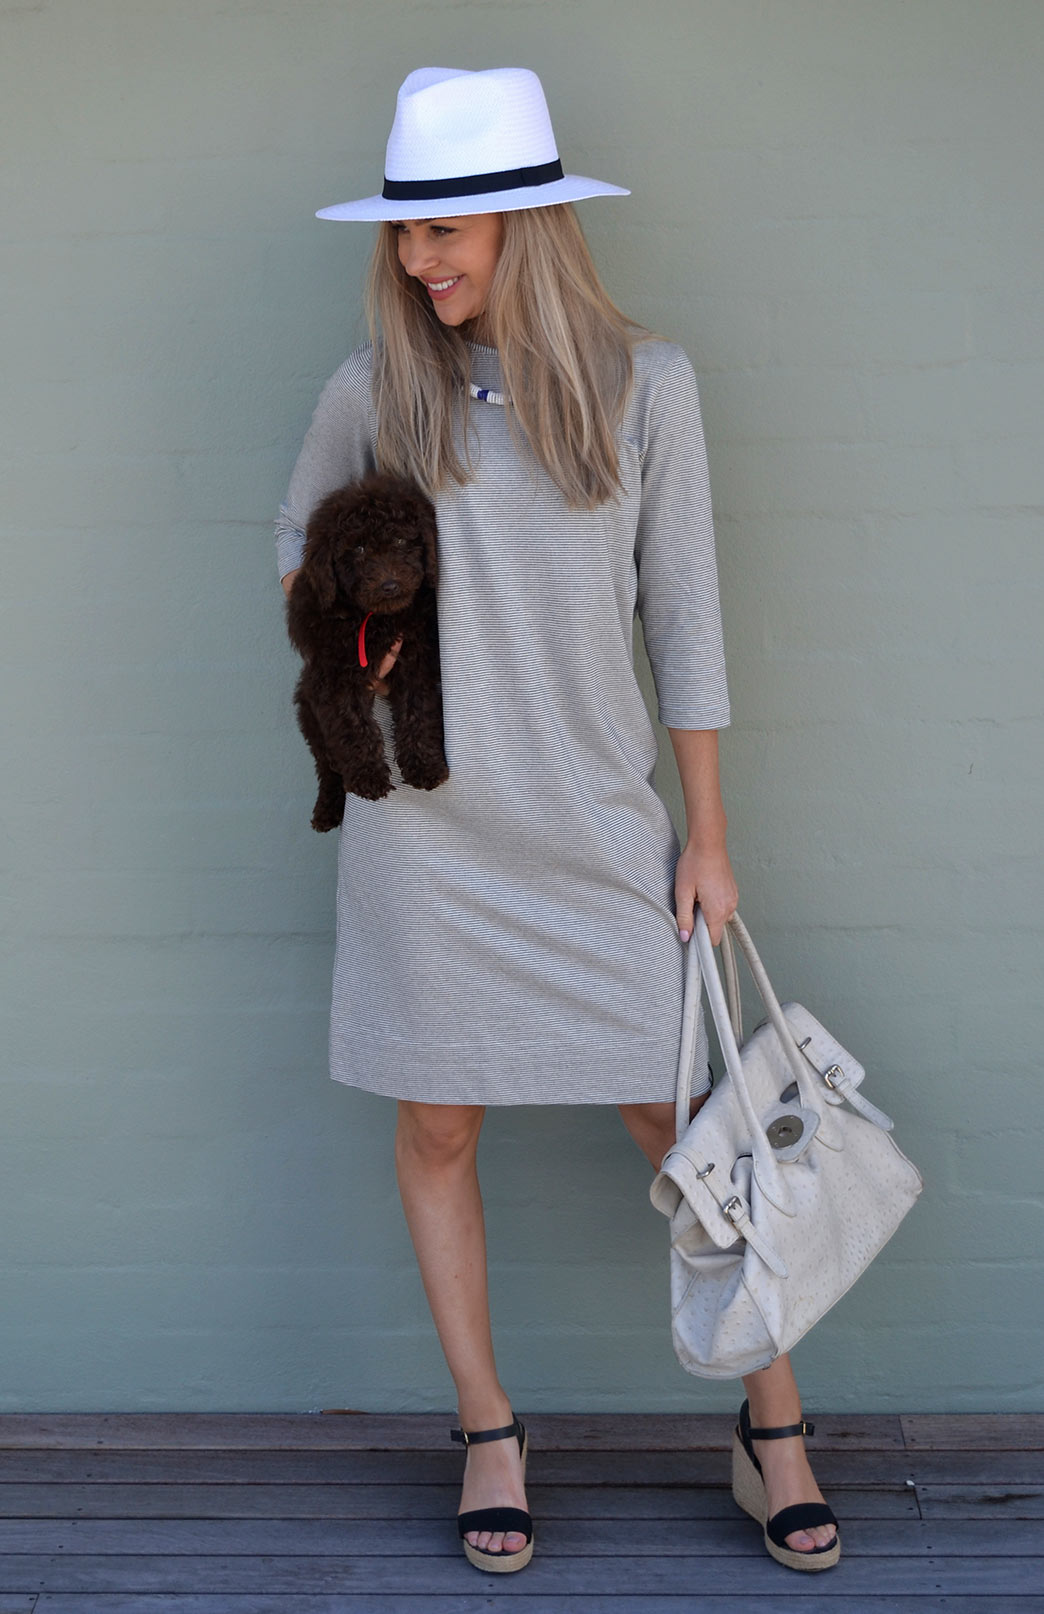 Audrey Dress - Organic Cotton - Women's Organic Cotton 3/4 Sleeve Summer Dress - Smitten Merino Tasmania Australia